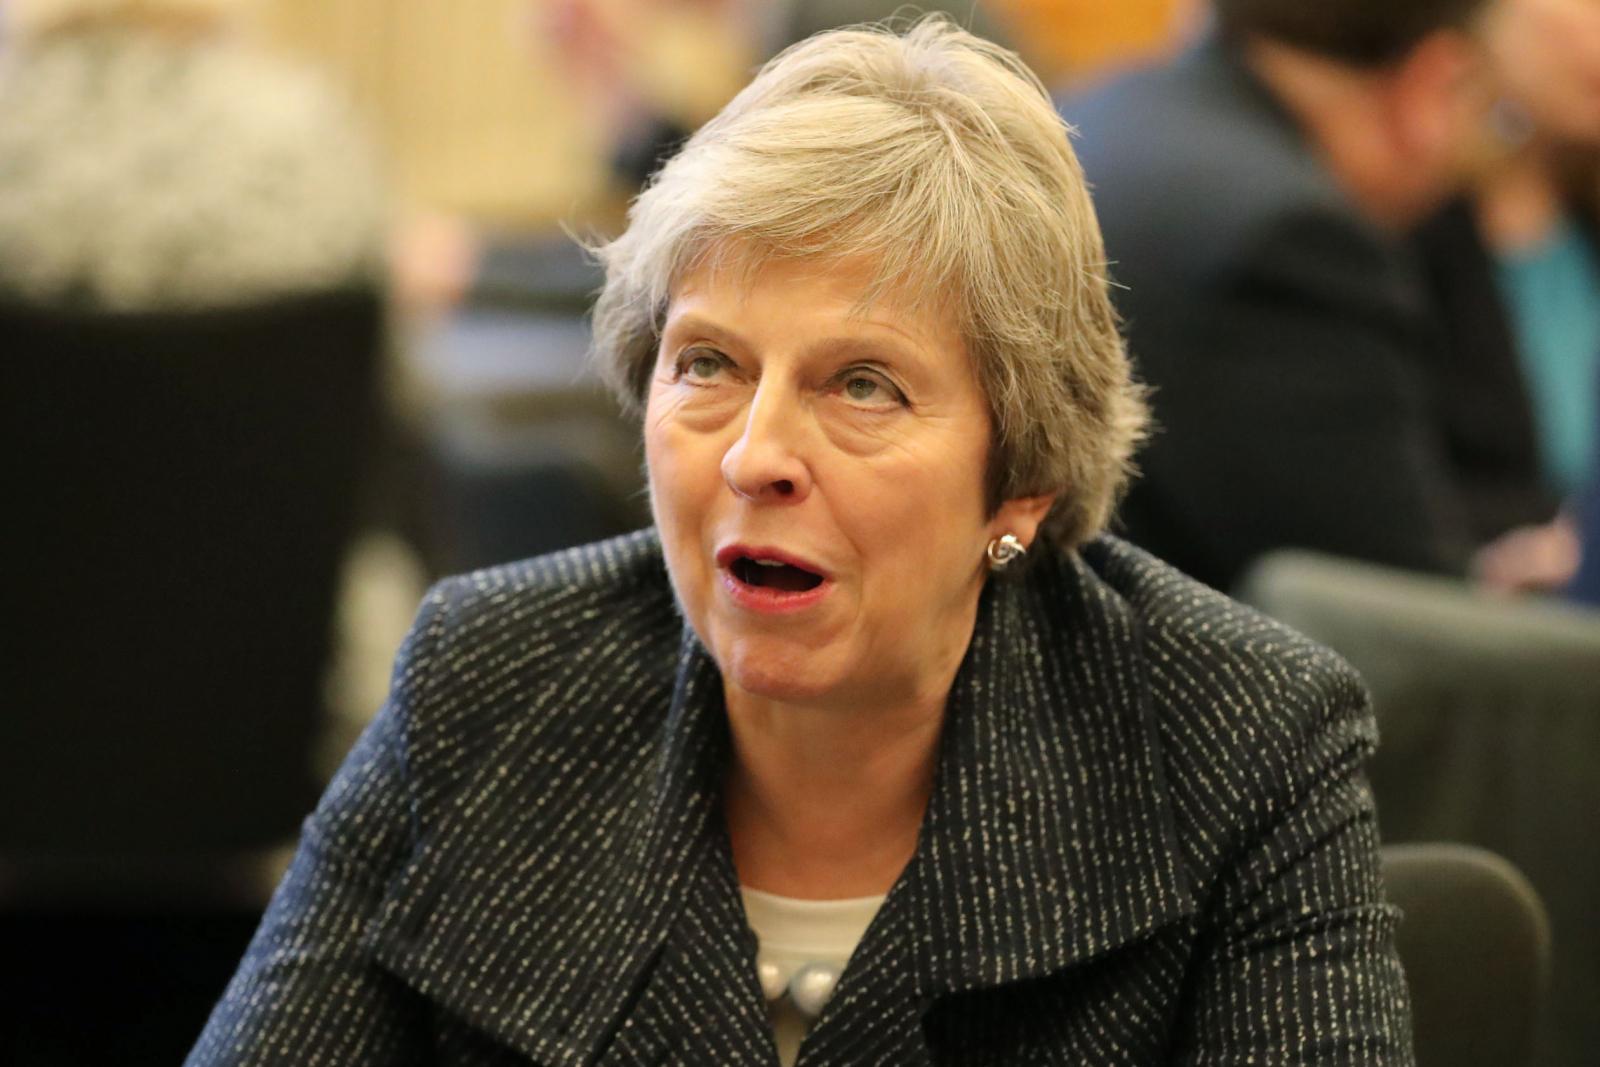 Top EU court hears Brexit challenge as critics slam May deal